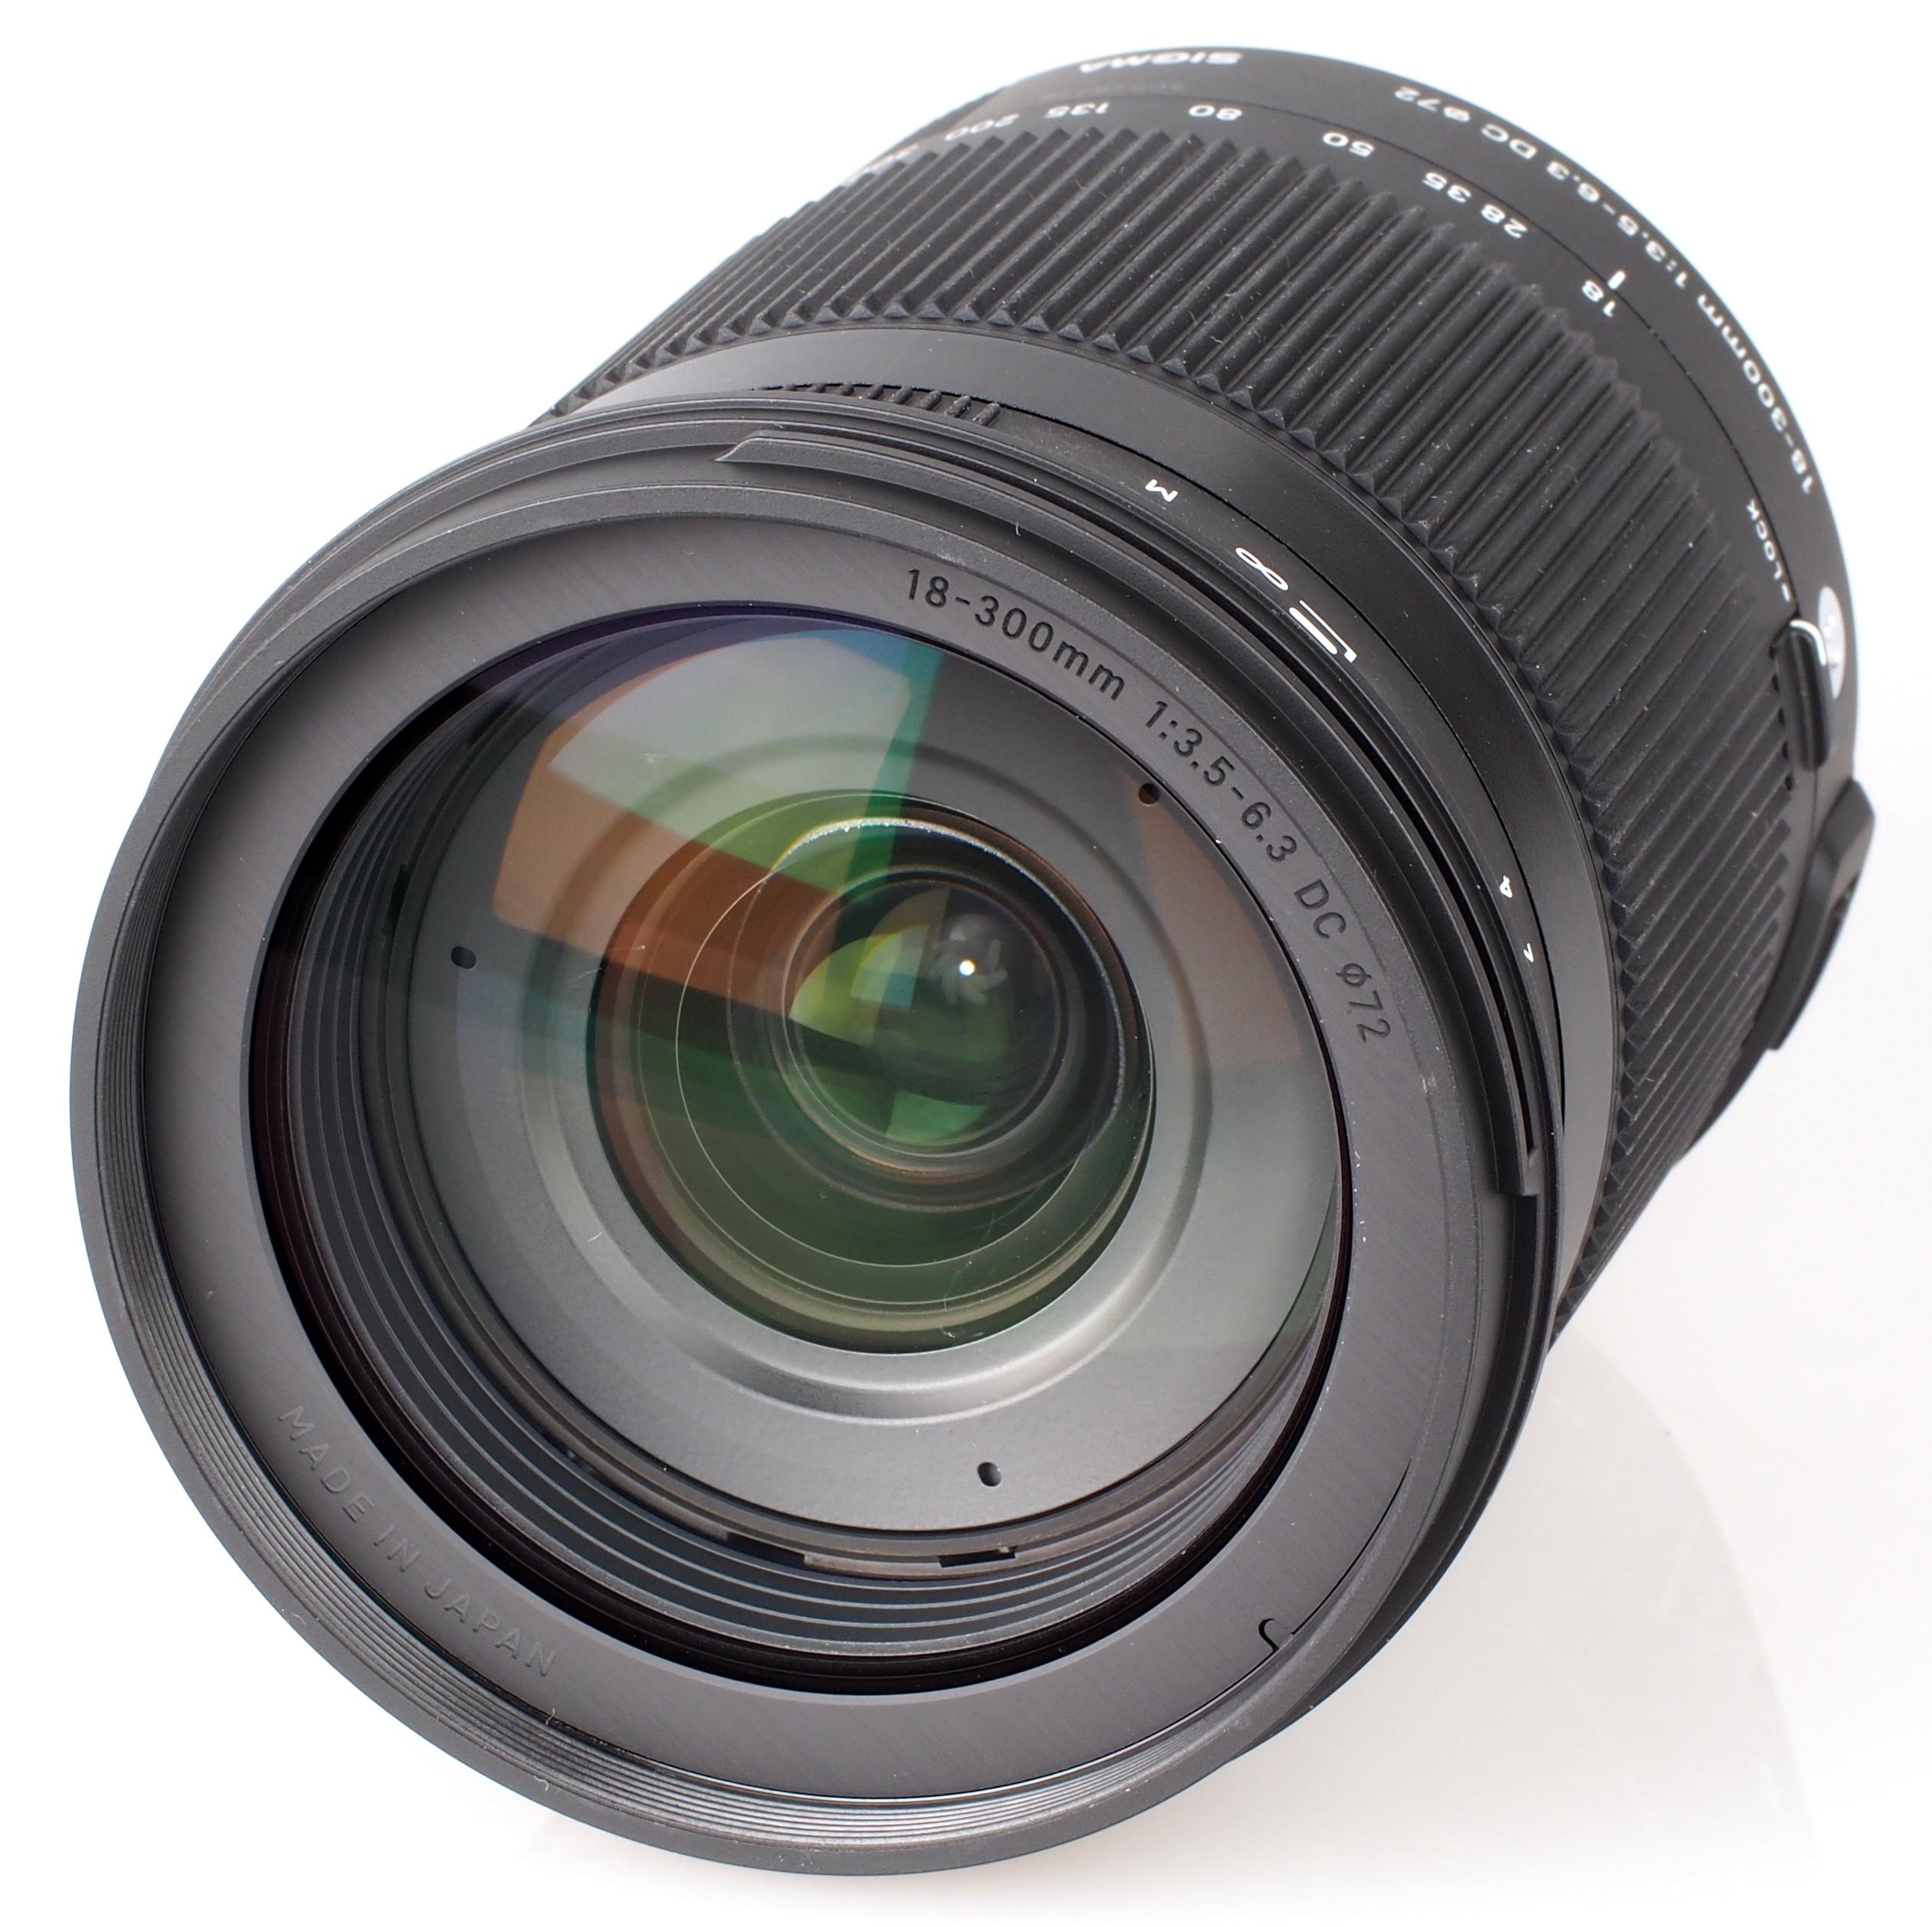 Serene Sigma Sigma Macro Os Hsm C Lens Review Sigma 18 300 Review Sigma 18 300 Nikon dpreview Sigma 18 300